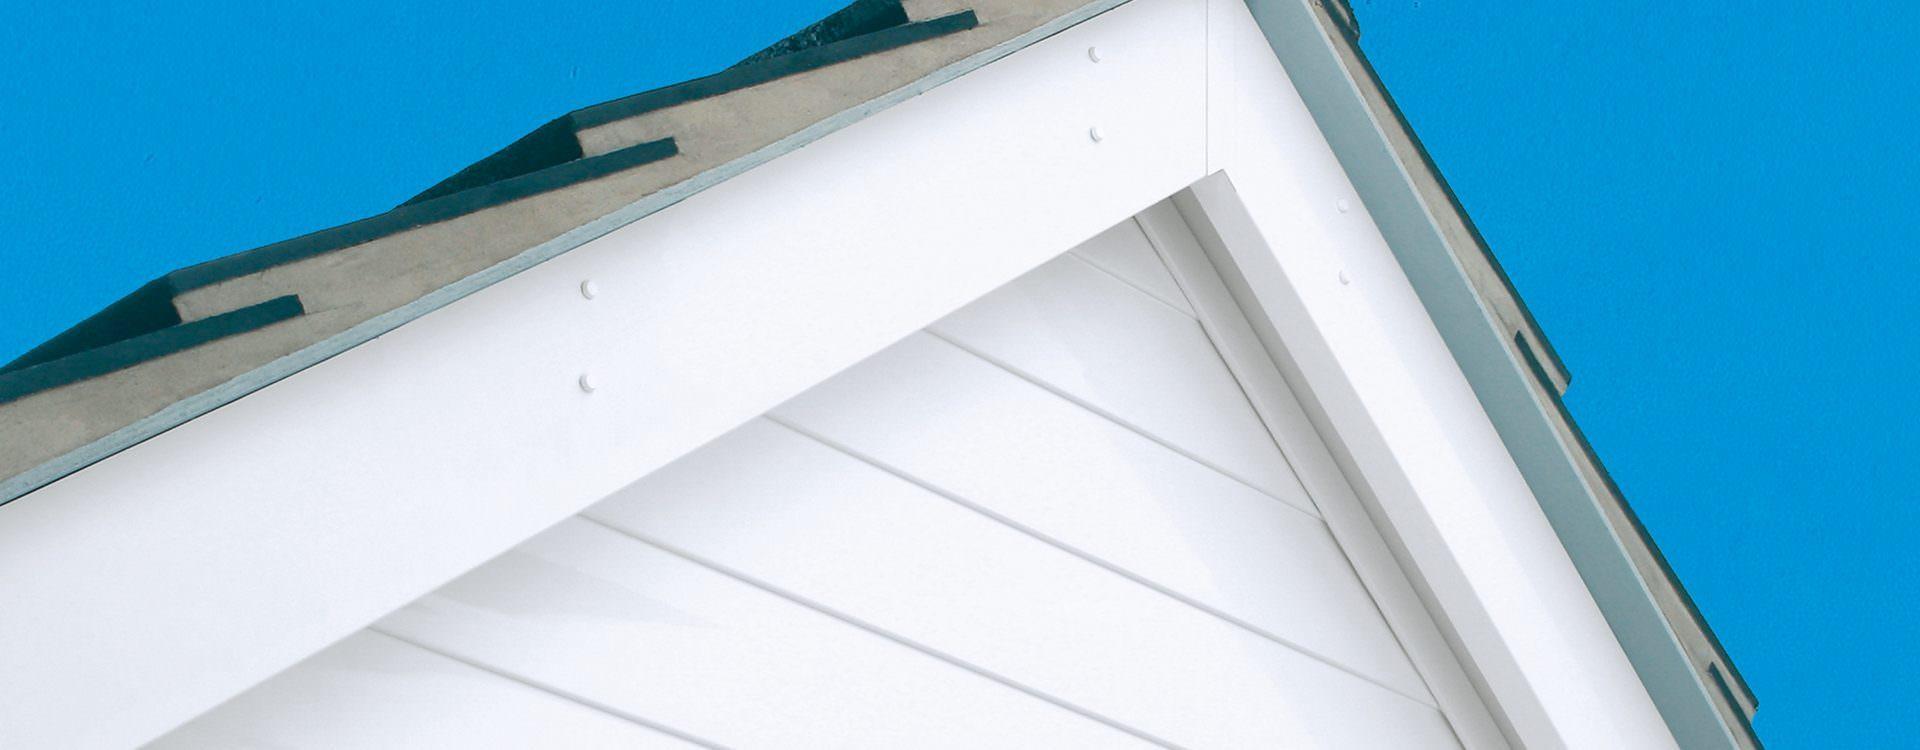 roofline cladding prices leeds